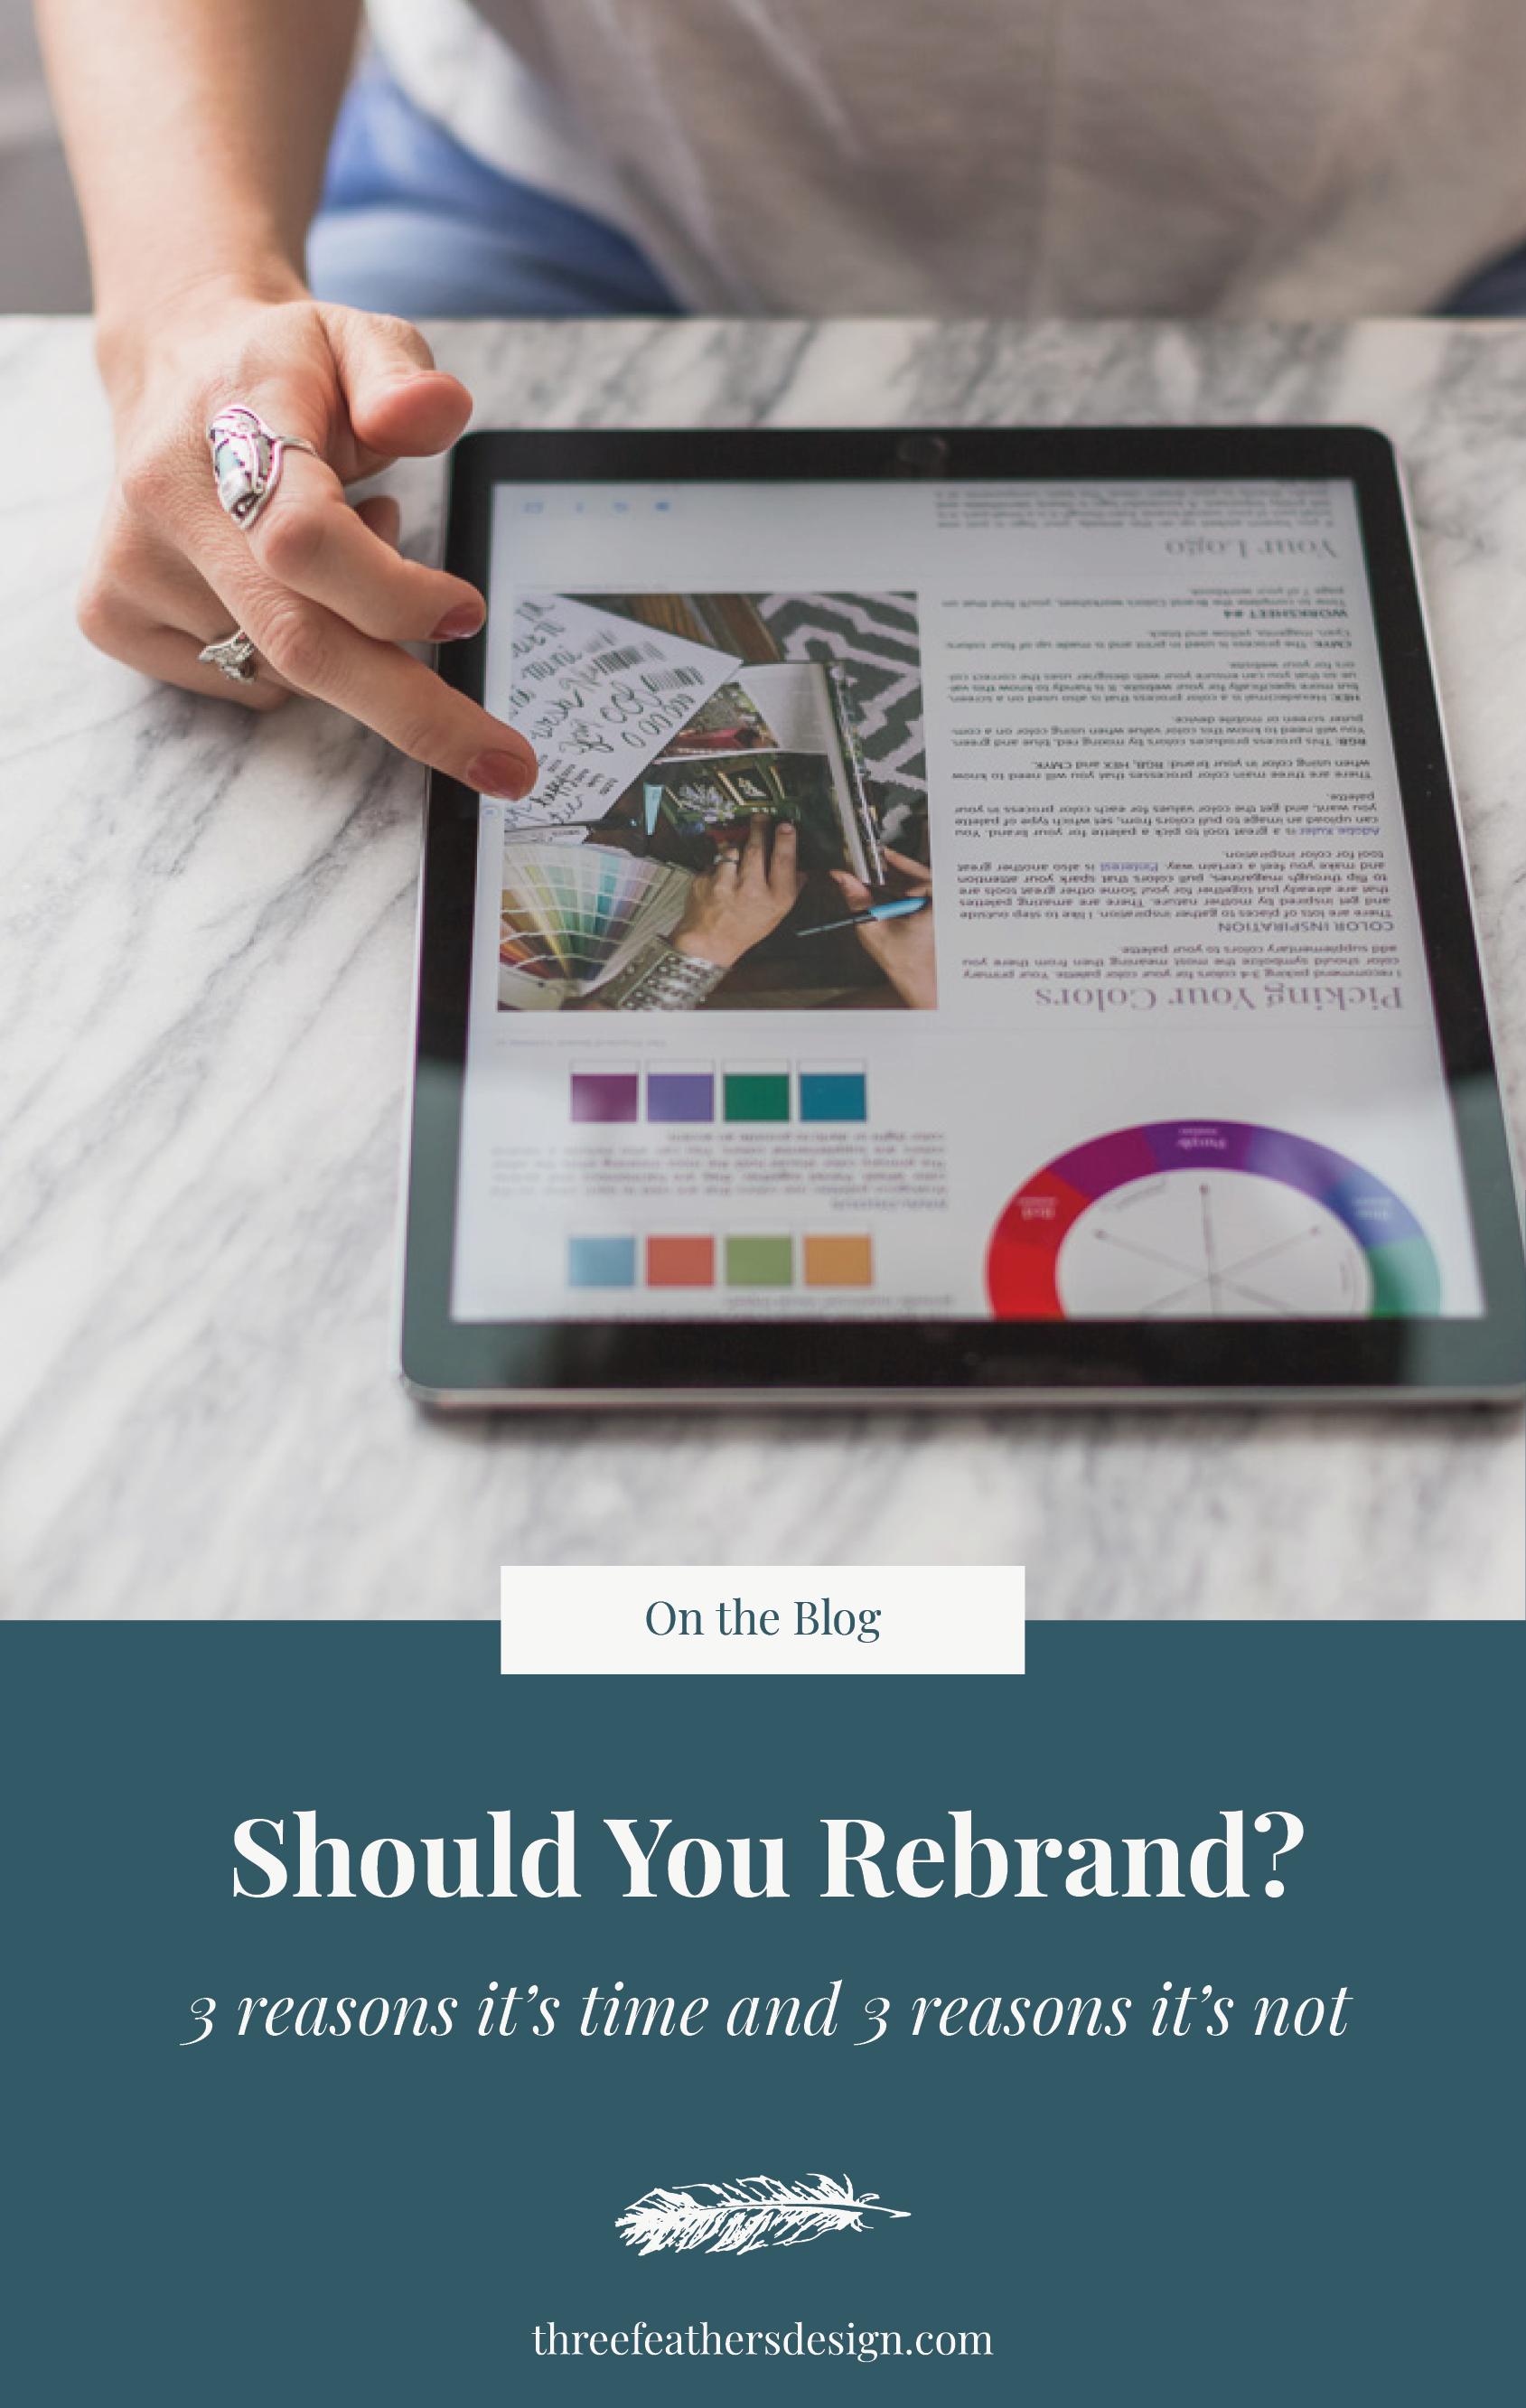 Should You Rebrand? | Three Feathers Design | threefeathersdesign.com